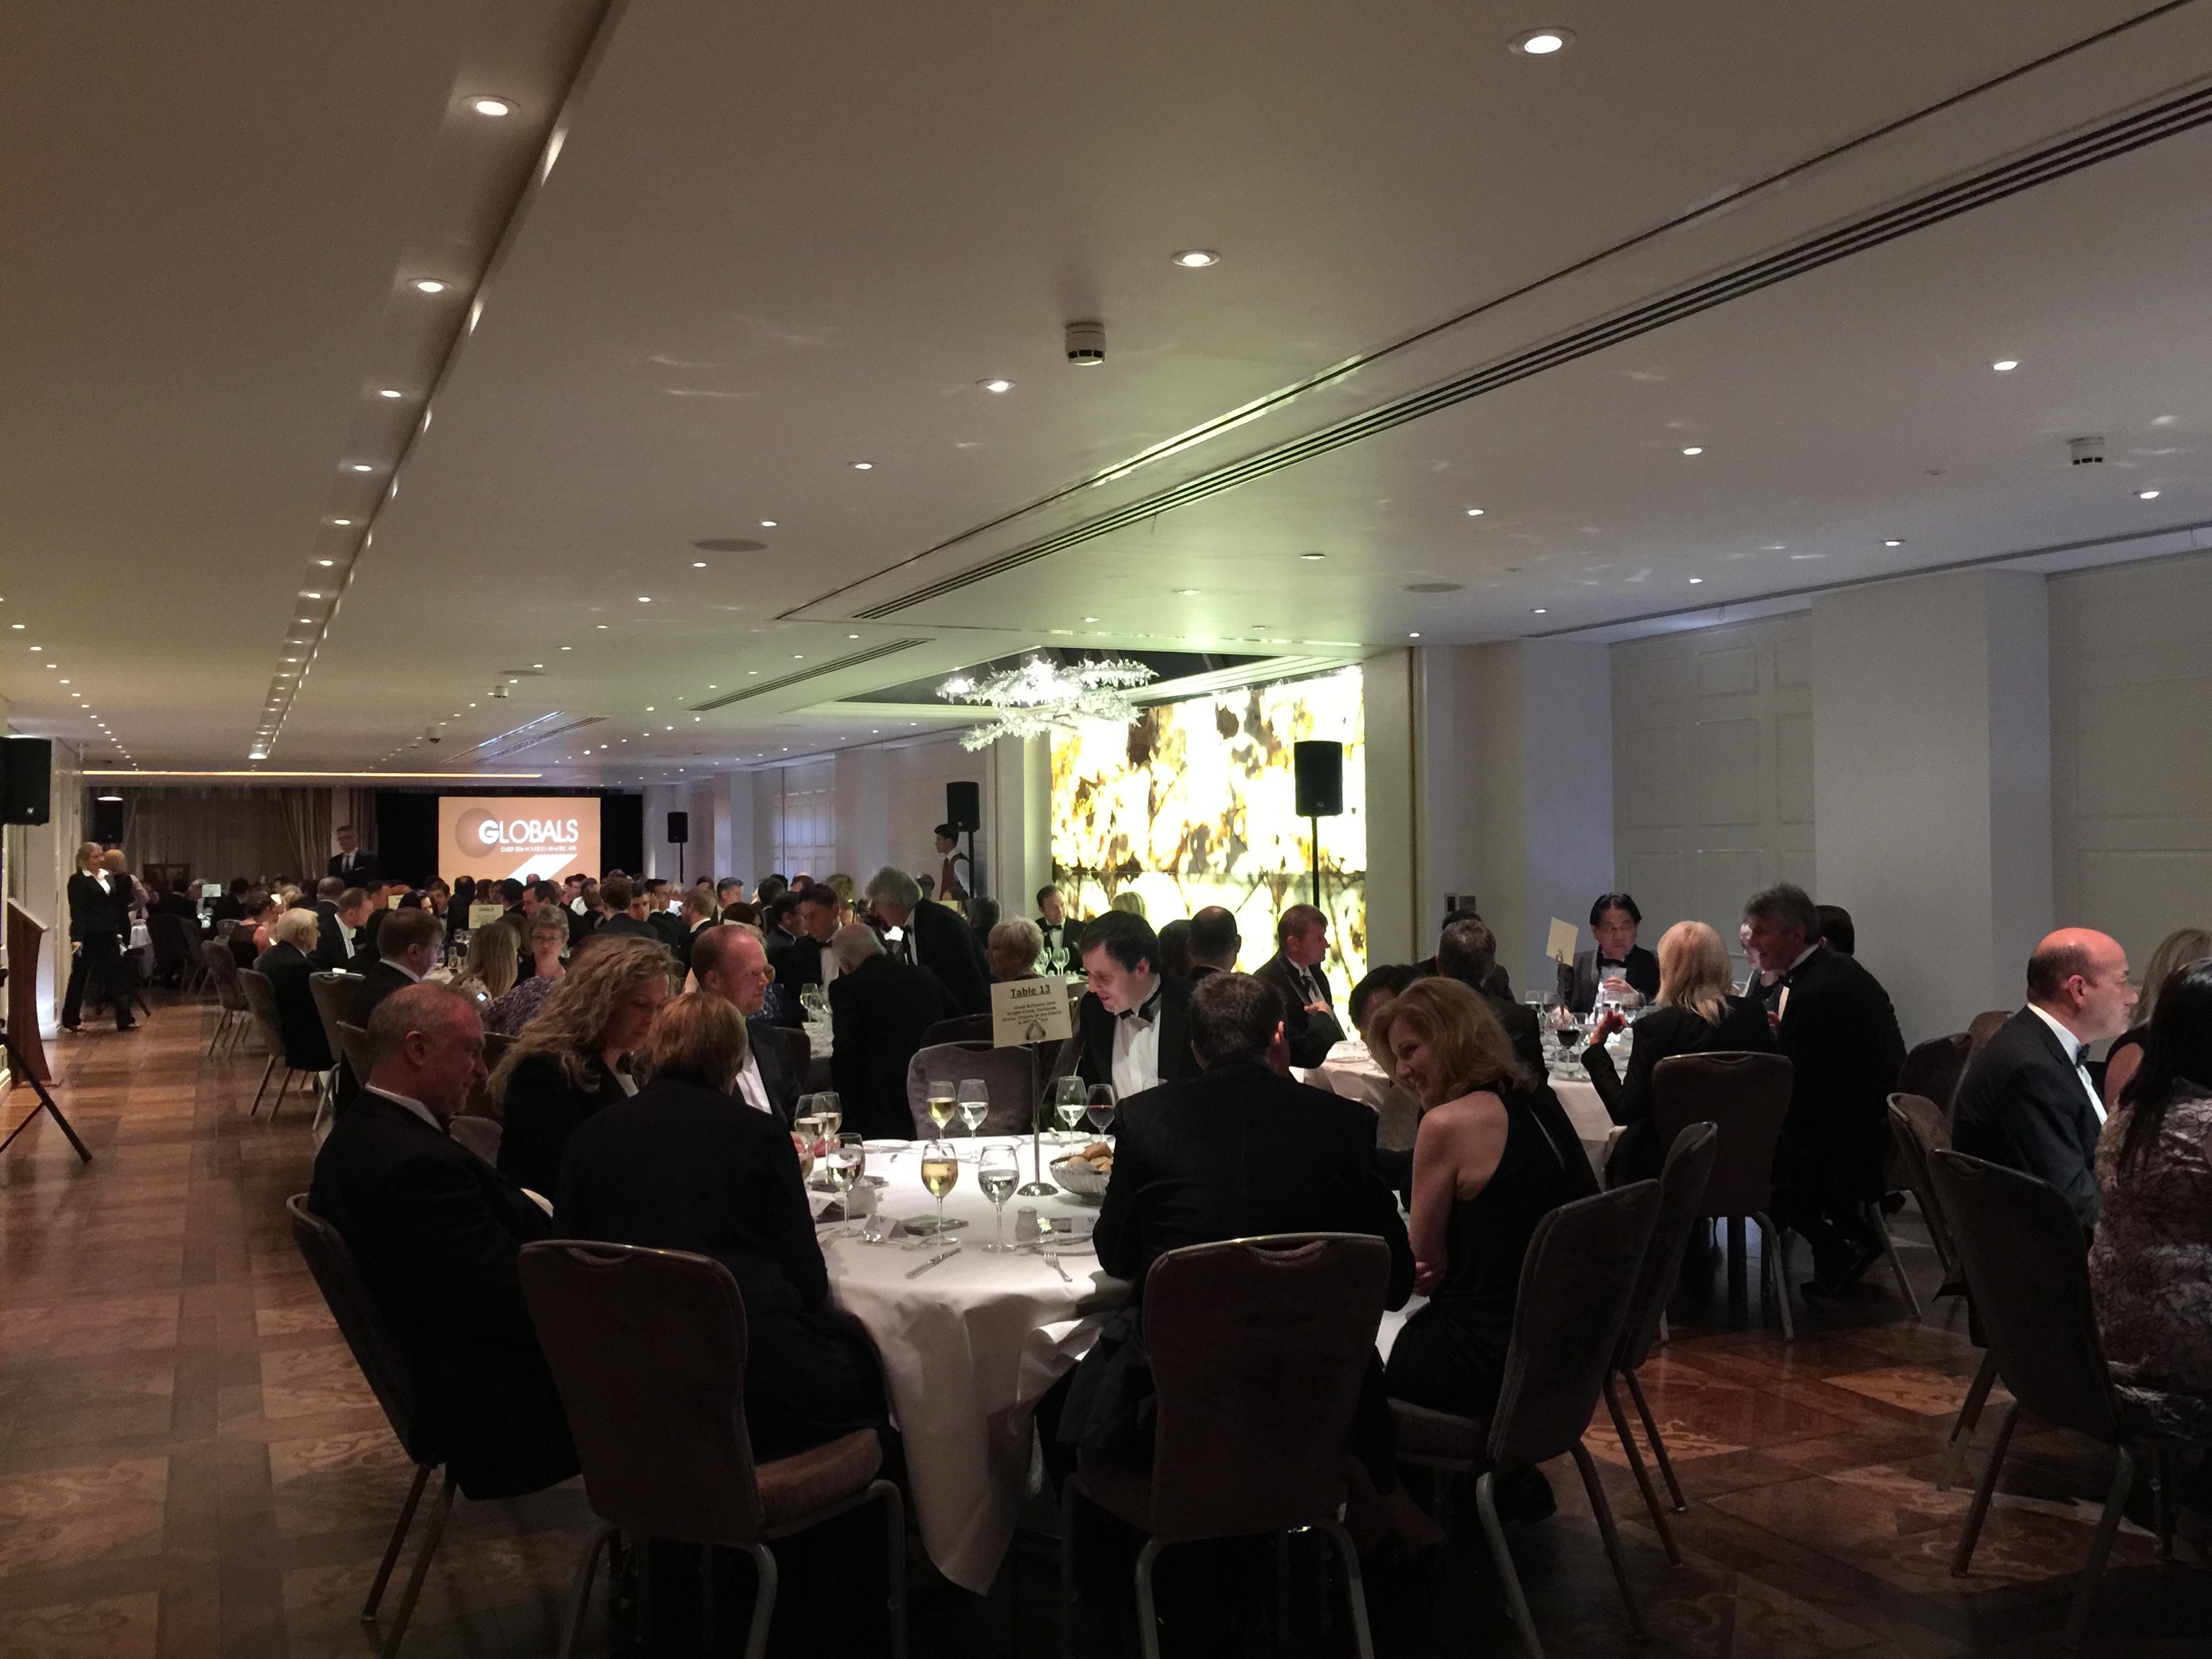 2014-11-13 (Penrose Care) Robert Stephenson-Padron UK Housing Over 50s Award 01